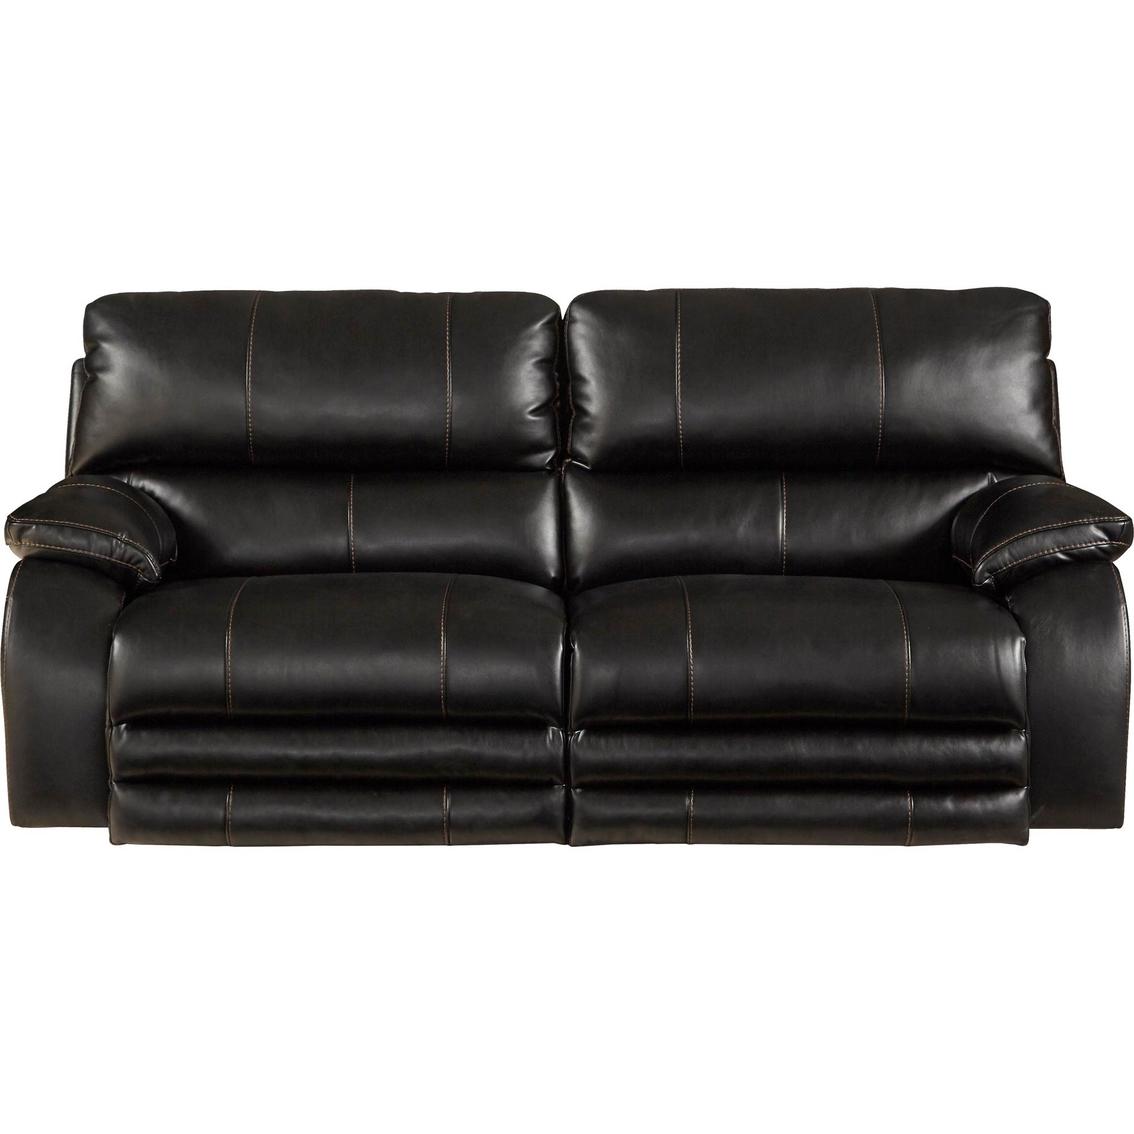 Catnapper Sheridan Power Lay Flat Reclining Sofa Sofas Couches